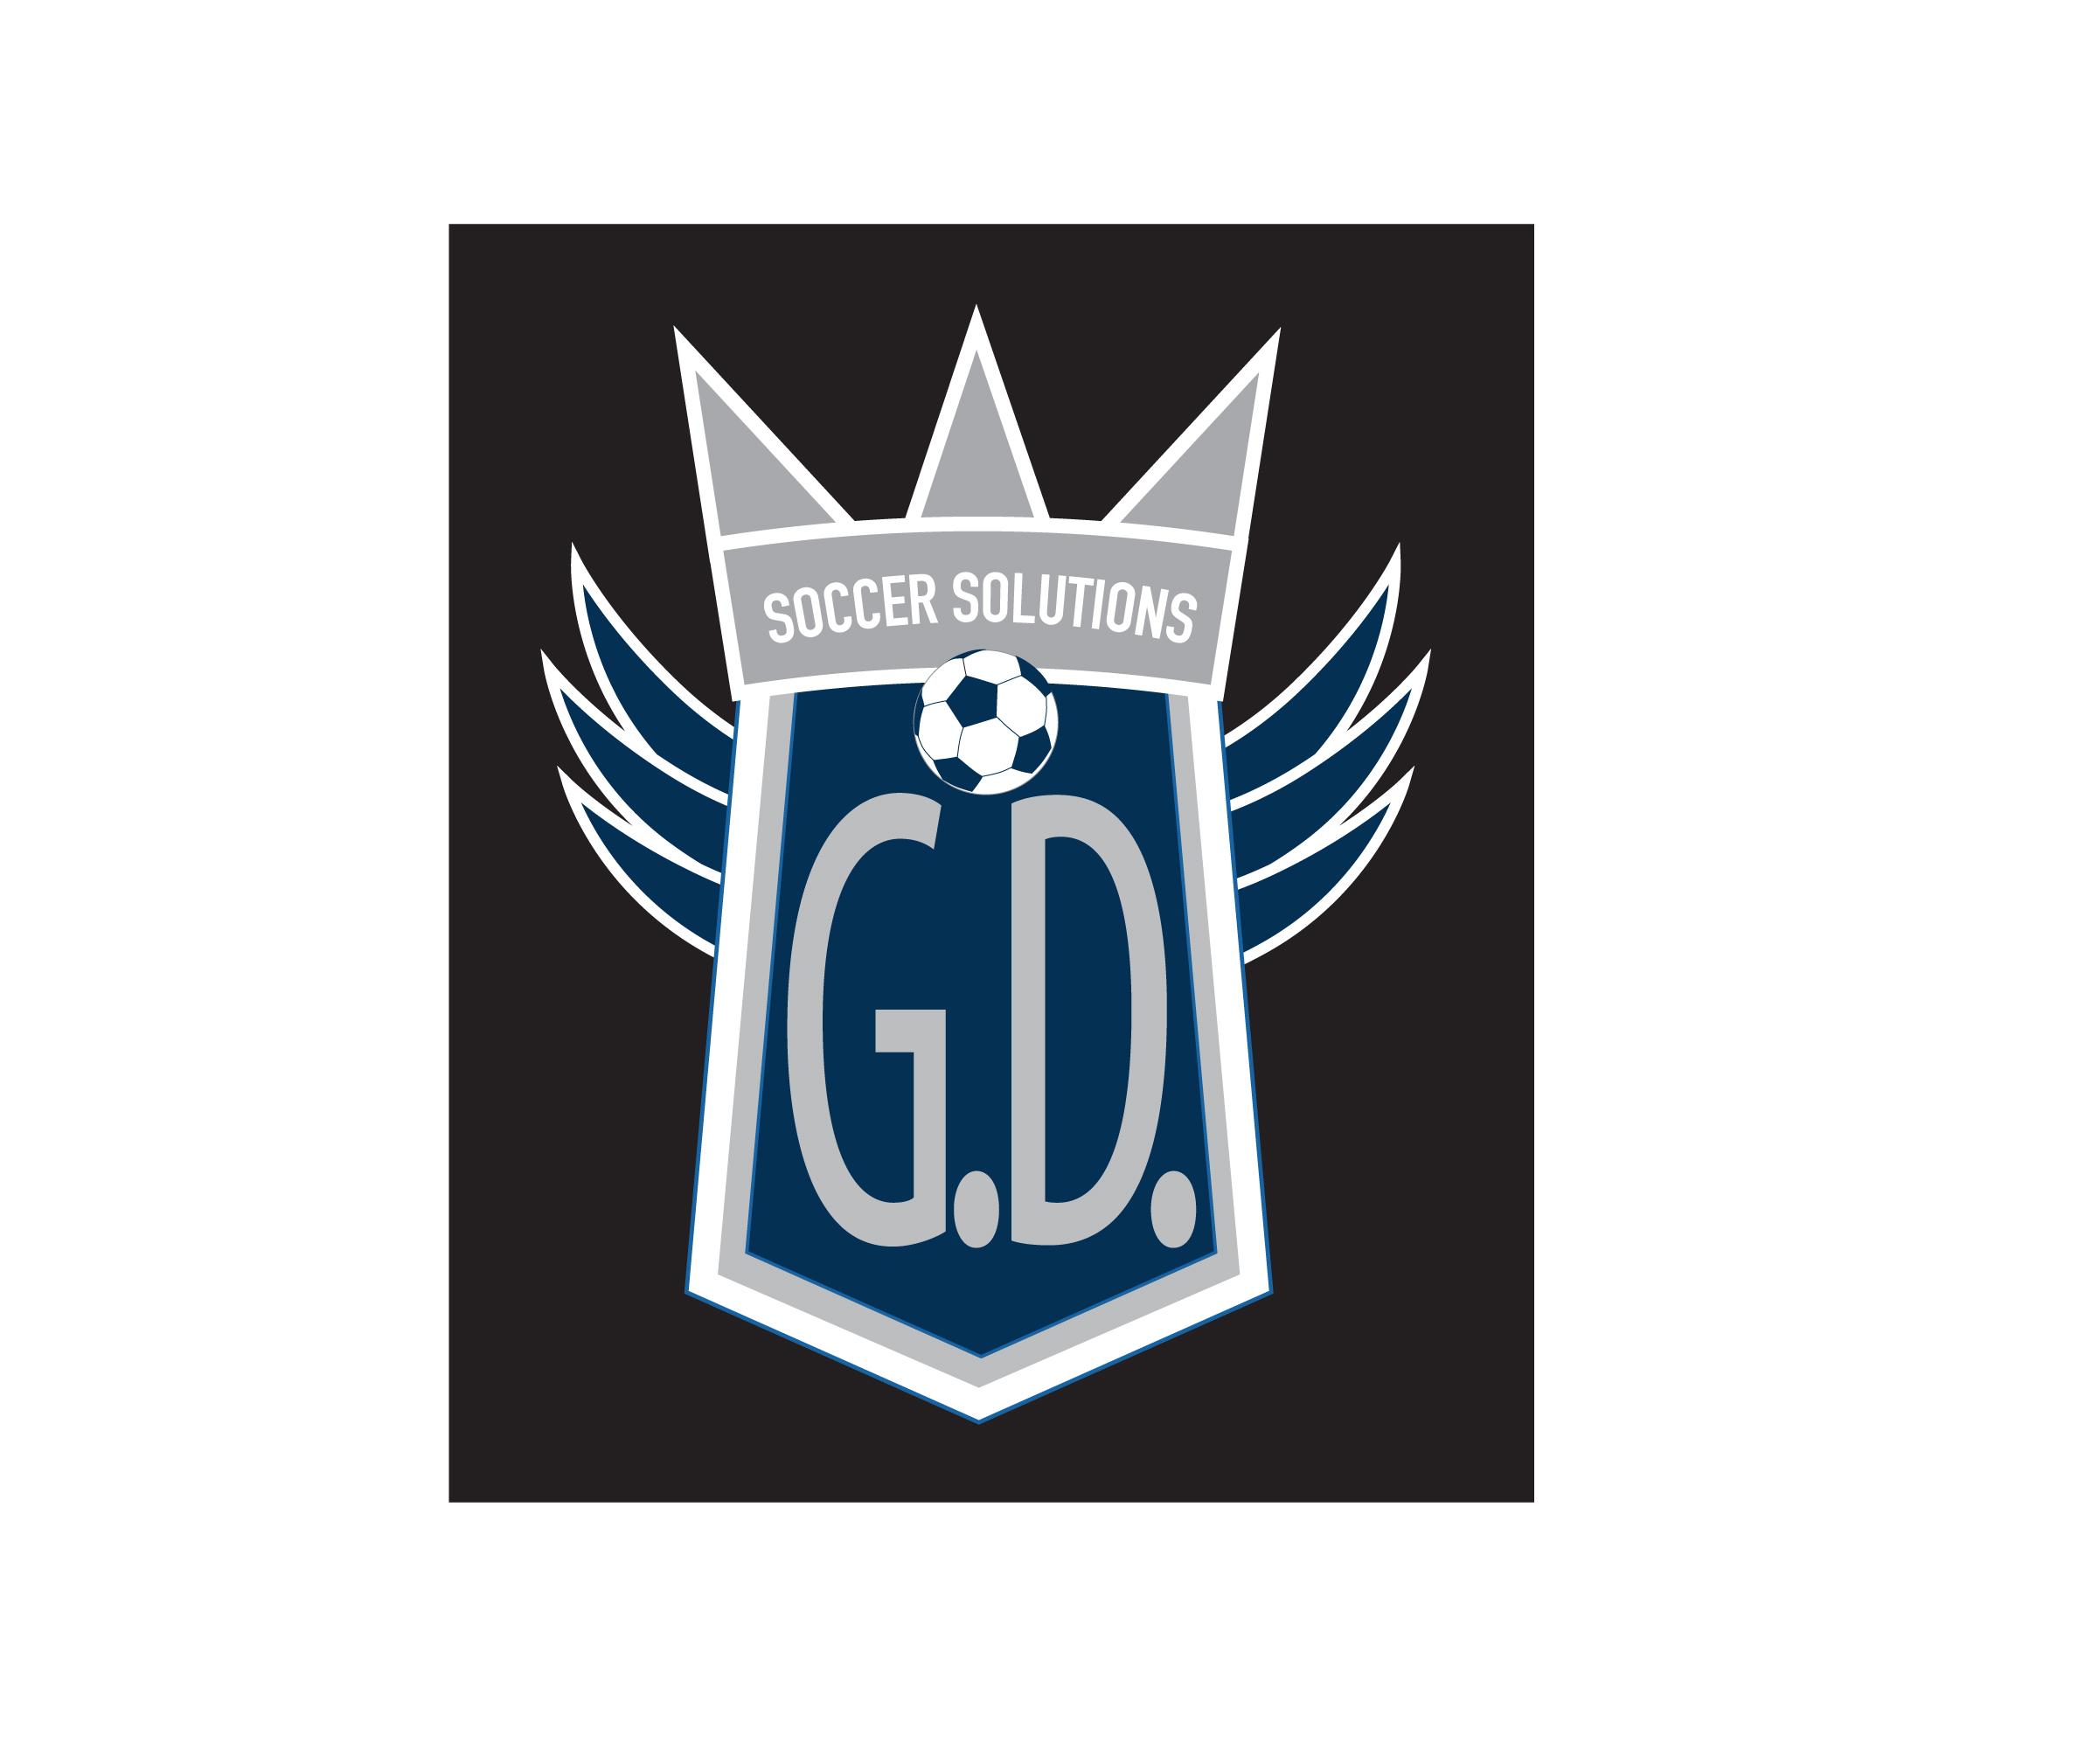 G.D. soccer solutionsv1.jpg